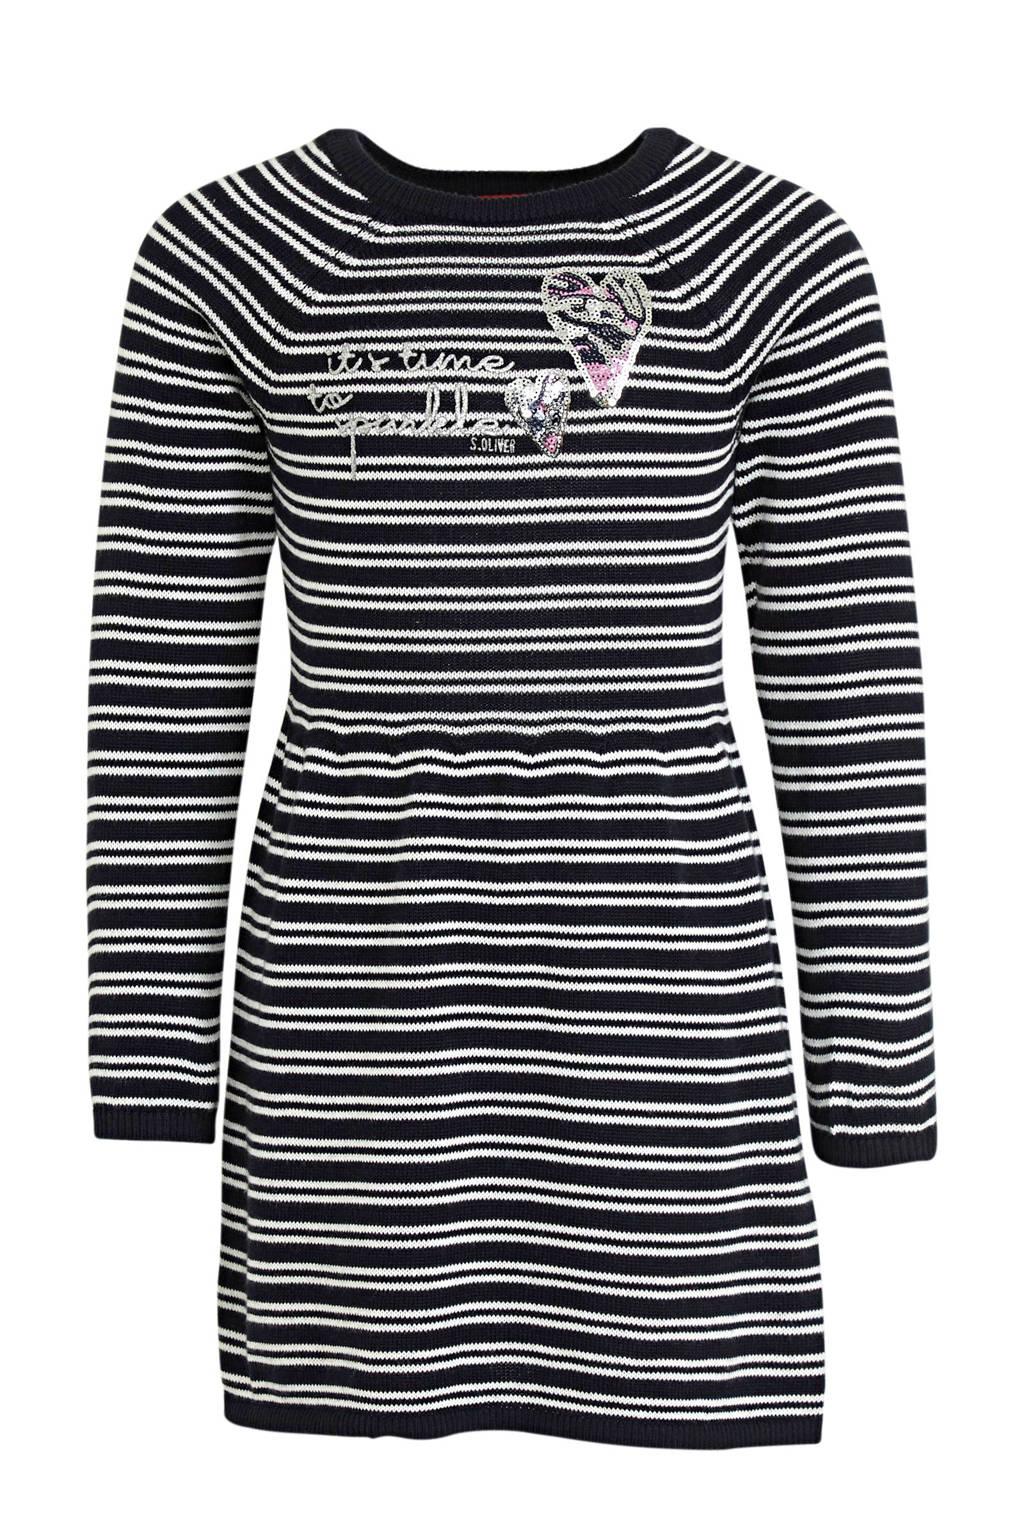 s.Oliver gestreepte jurk marine/wit, Marine/wit